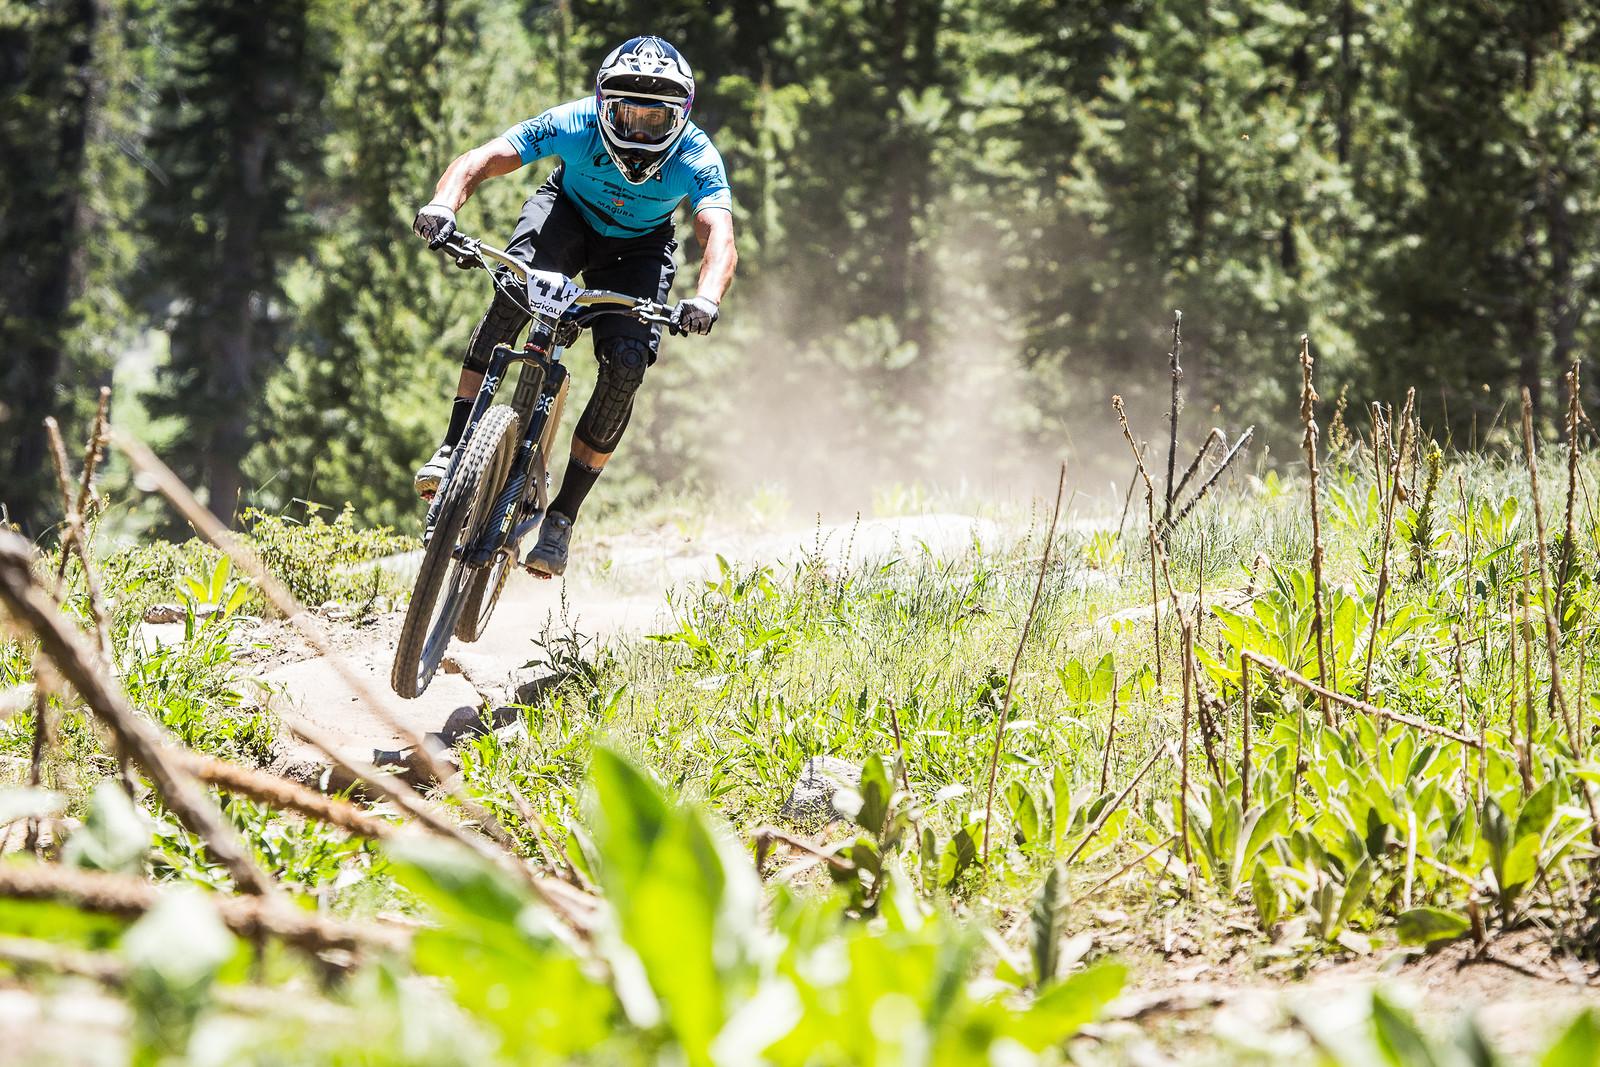 Brian Lopes Pro Men's Winner, VP EnduroFest CES China Peak - danseverson photo - Mountain Biking Pictures - Vital MTB